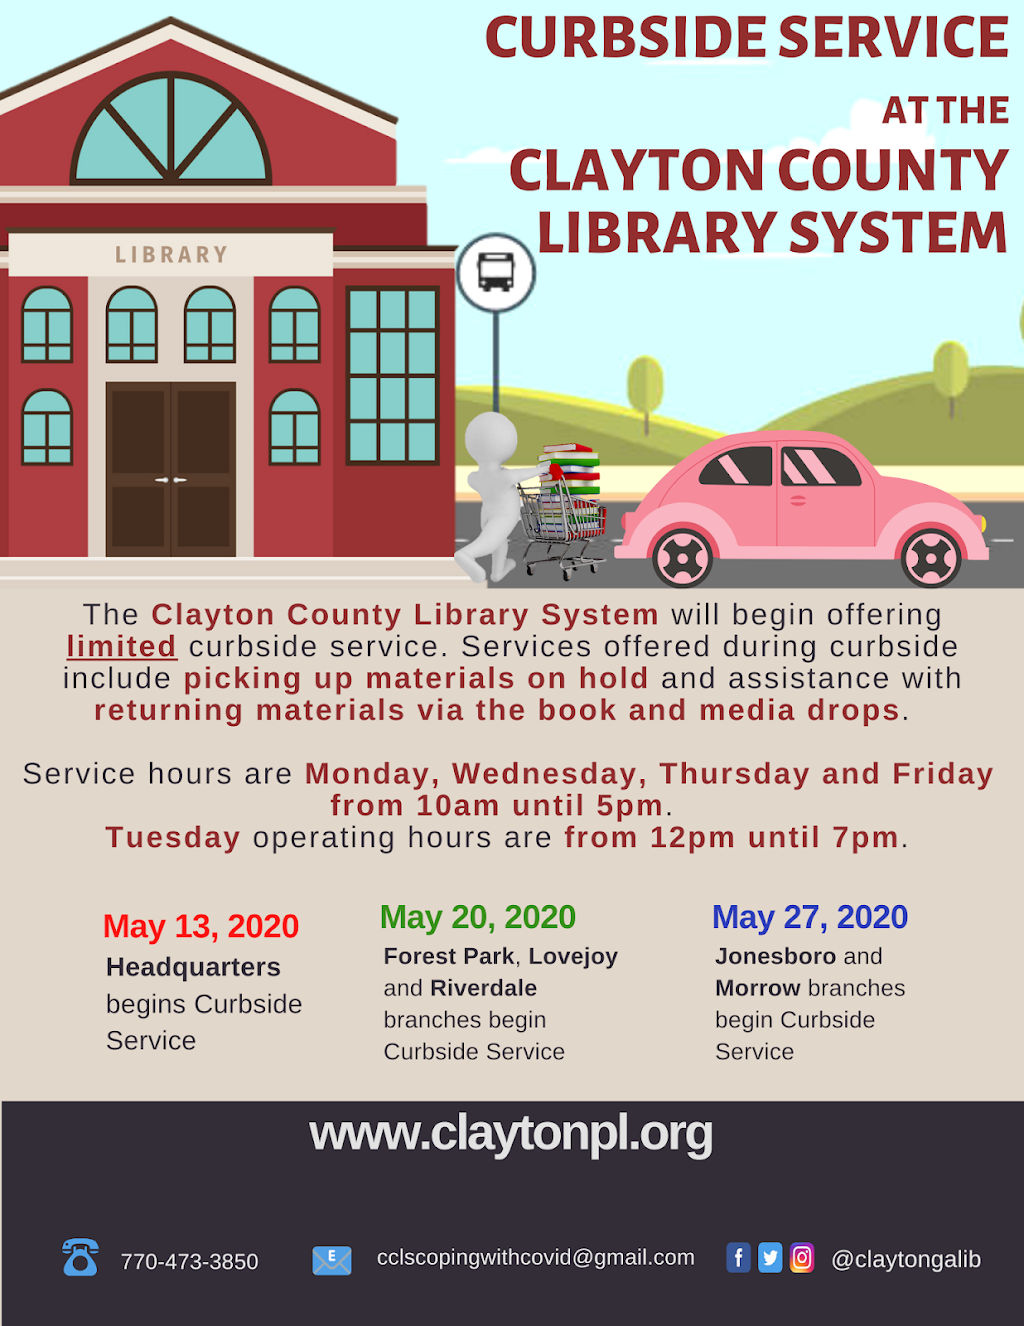 Clayton County Library System - Morrow Branch - library  | Photo 5 of 5 | Address: 6225 Maddox Rd, Morrow, GA 30260, USA | Phone: (770) 347-0170